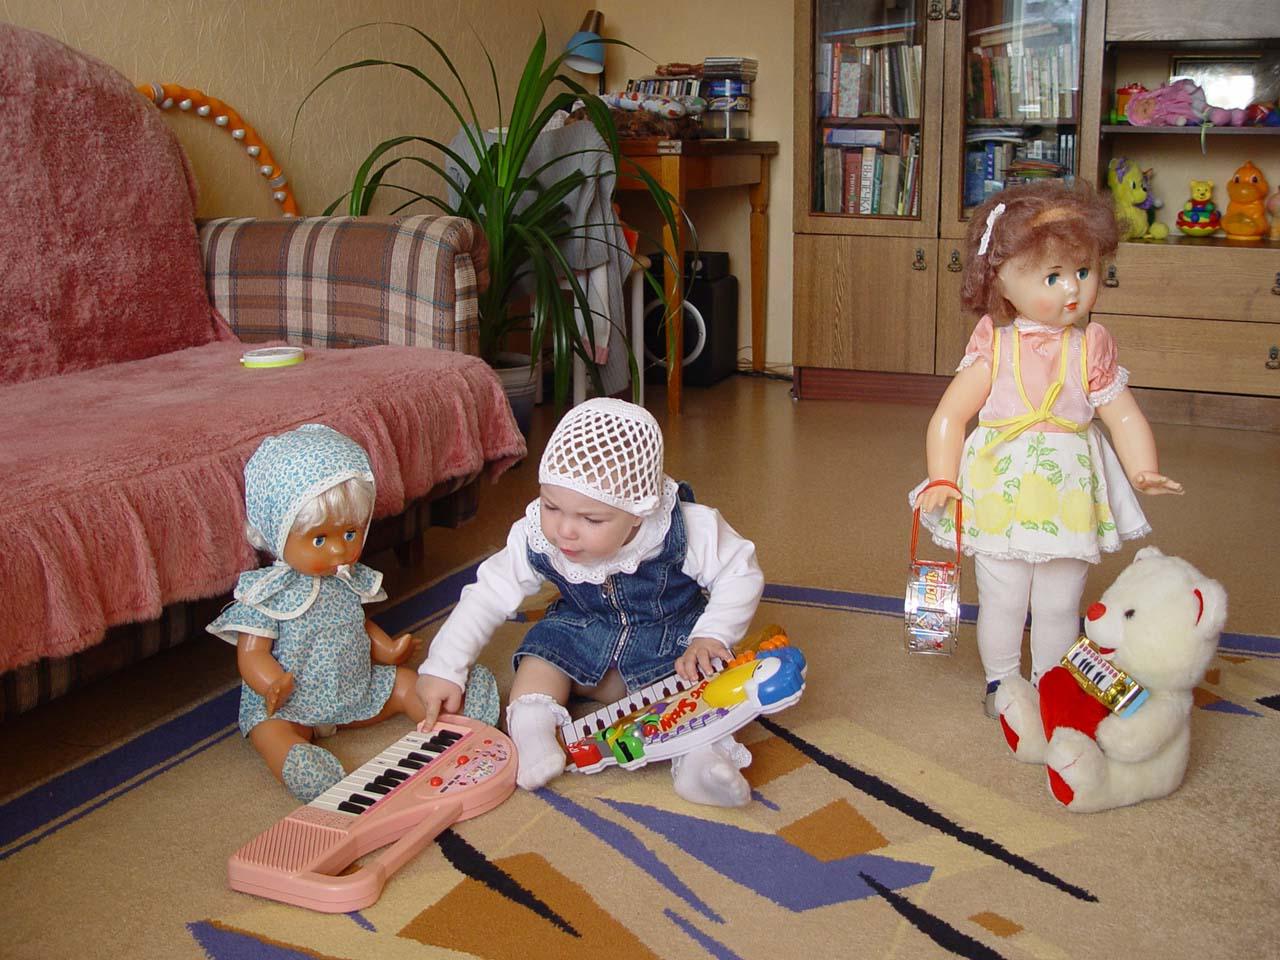 Домашний оркестр. Дети и музыка